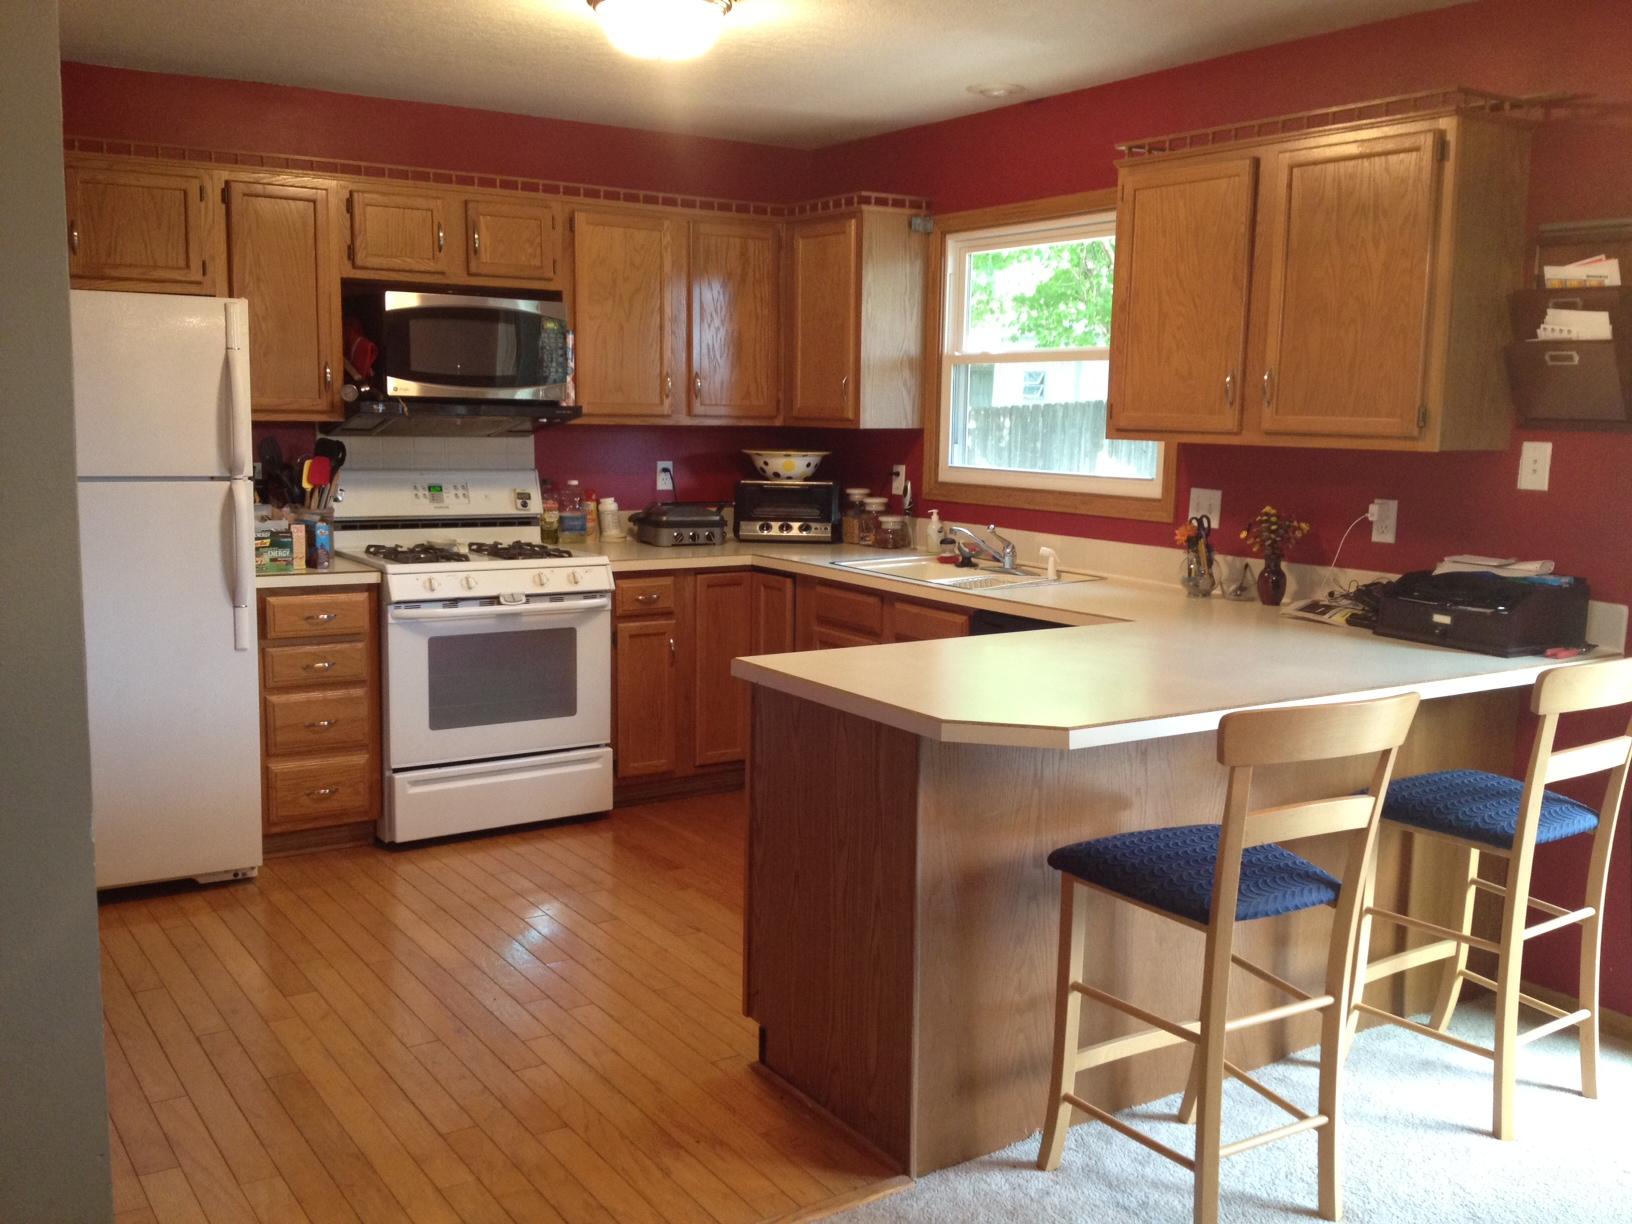 painting kitchen cabinets brown kitchen cabinets painting kitchen cabinets before picture